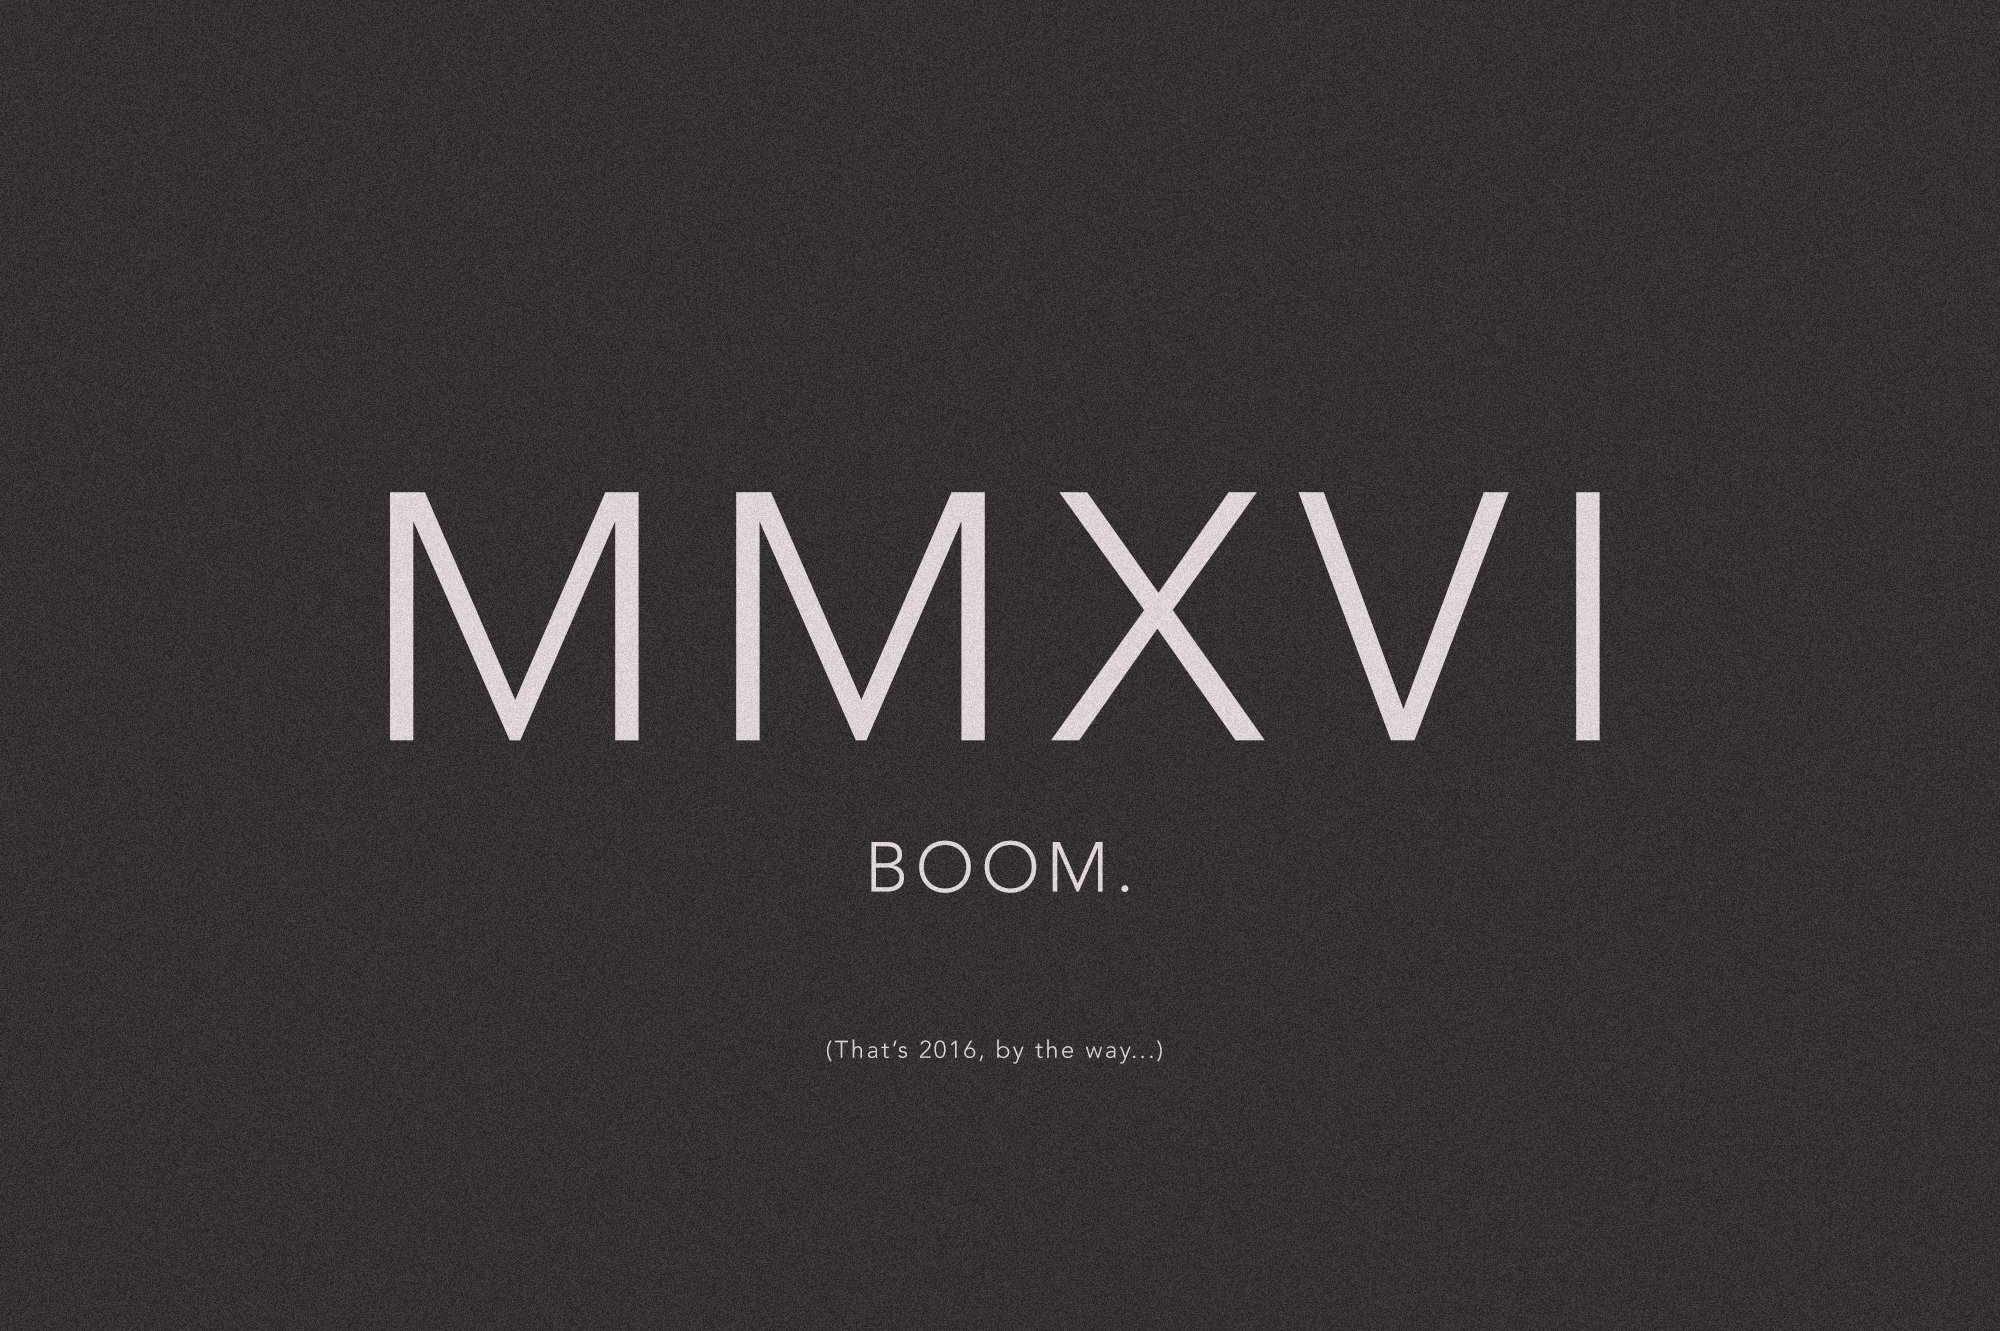 Best of 2016 MMXVI